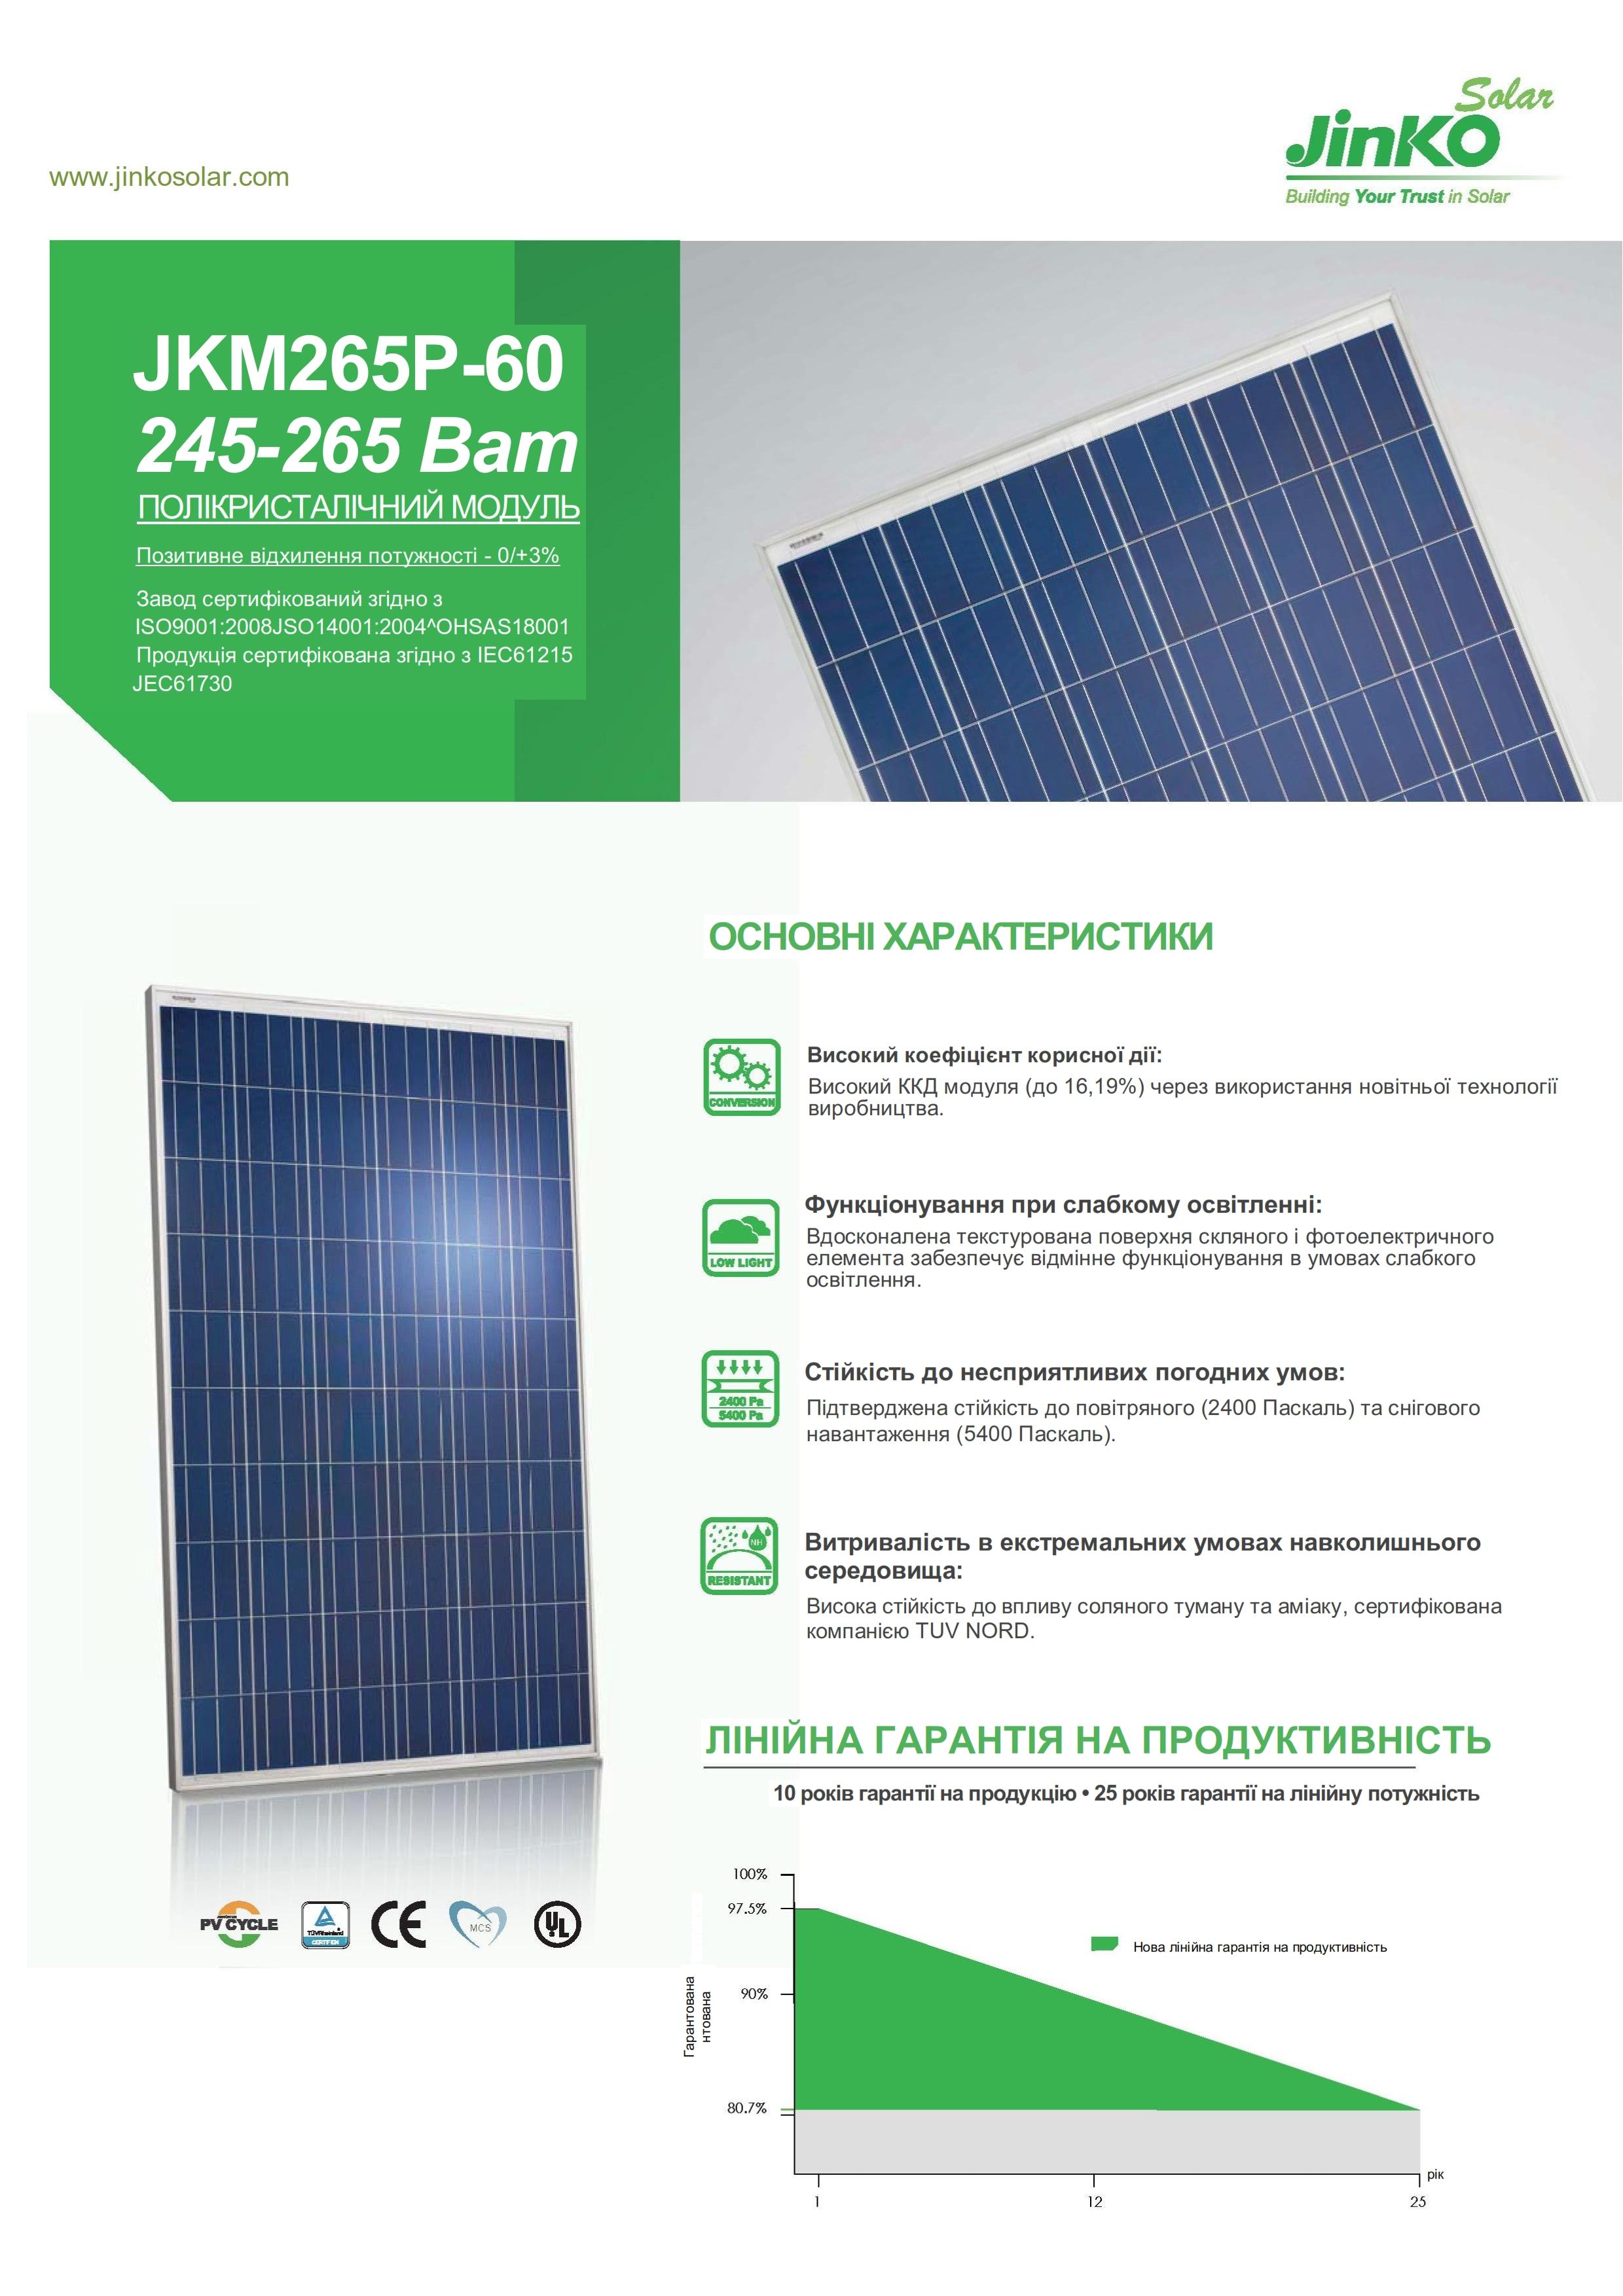 Jinko Solar JKM260P-60 цена Днепропетровск